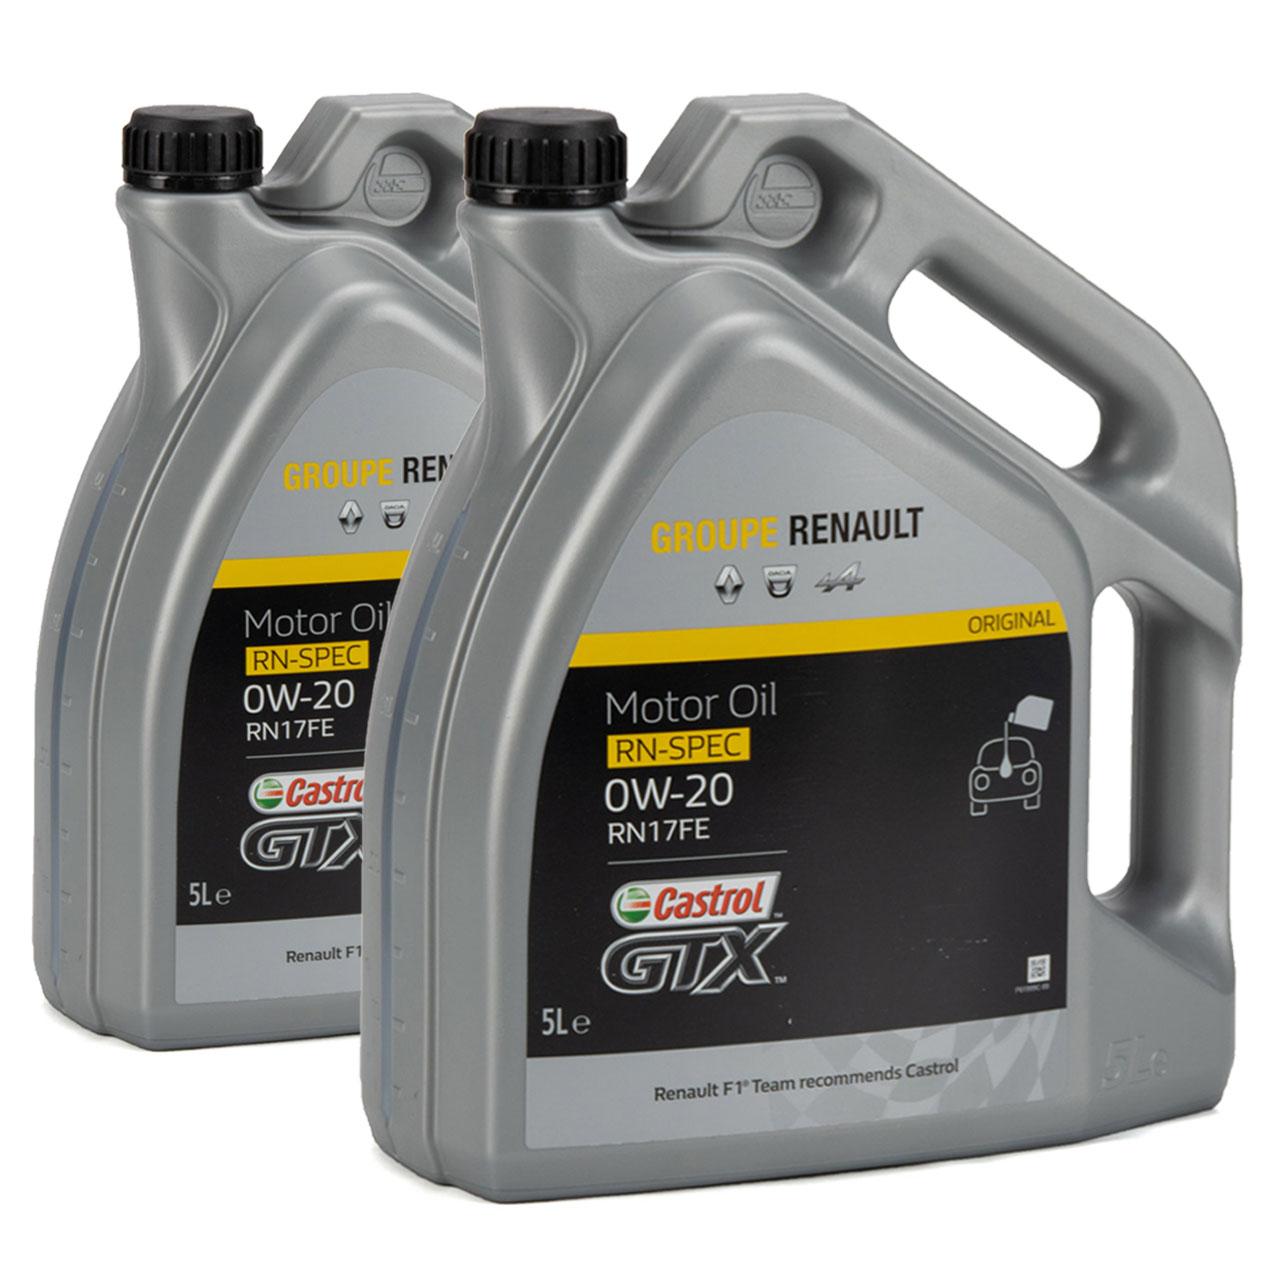 CASTROL Motoröl Öl GTX RN-SPEC 0W-20 0W20 für Renault RN17FE - 10L 10 Liter